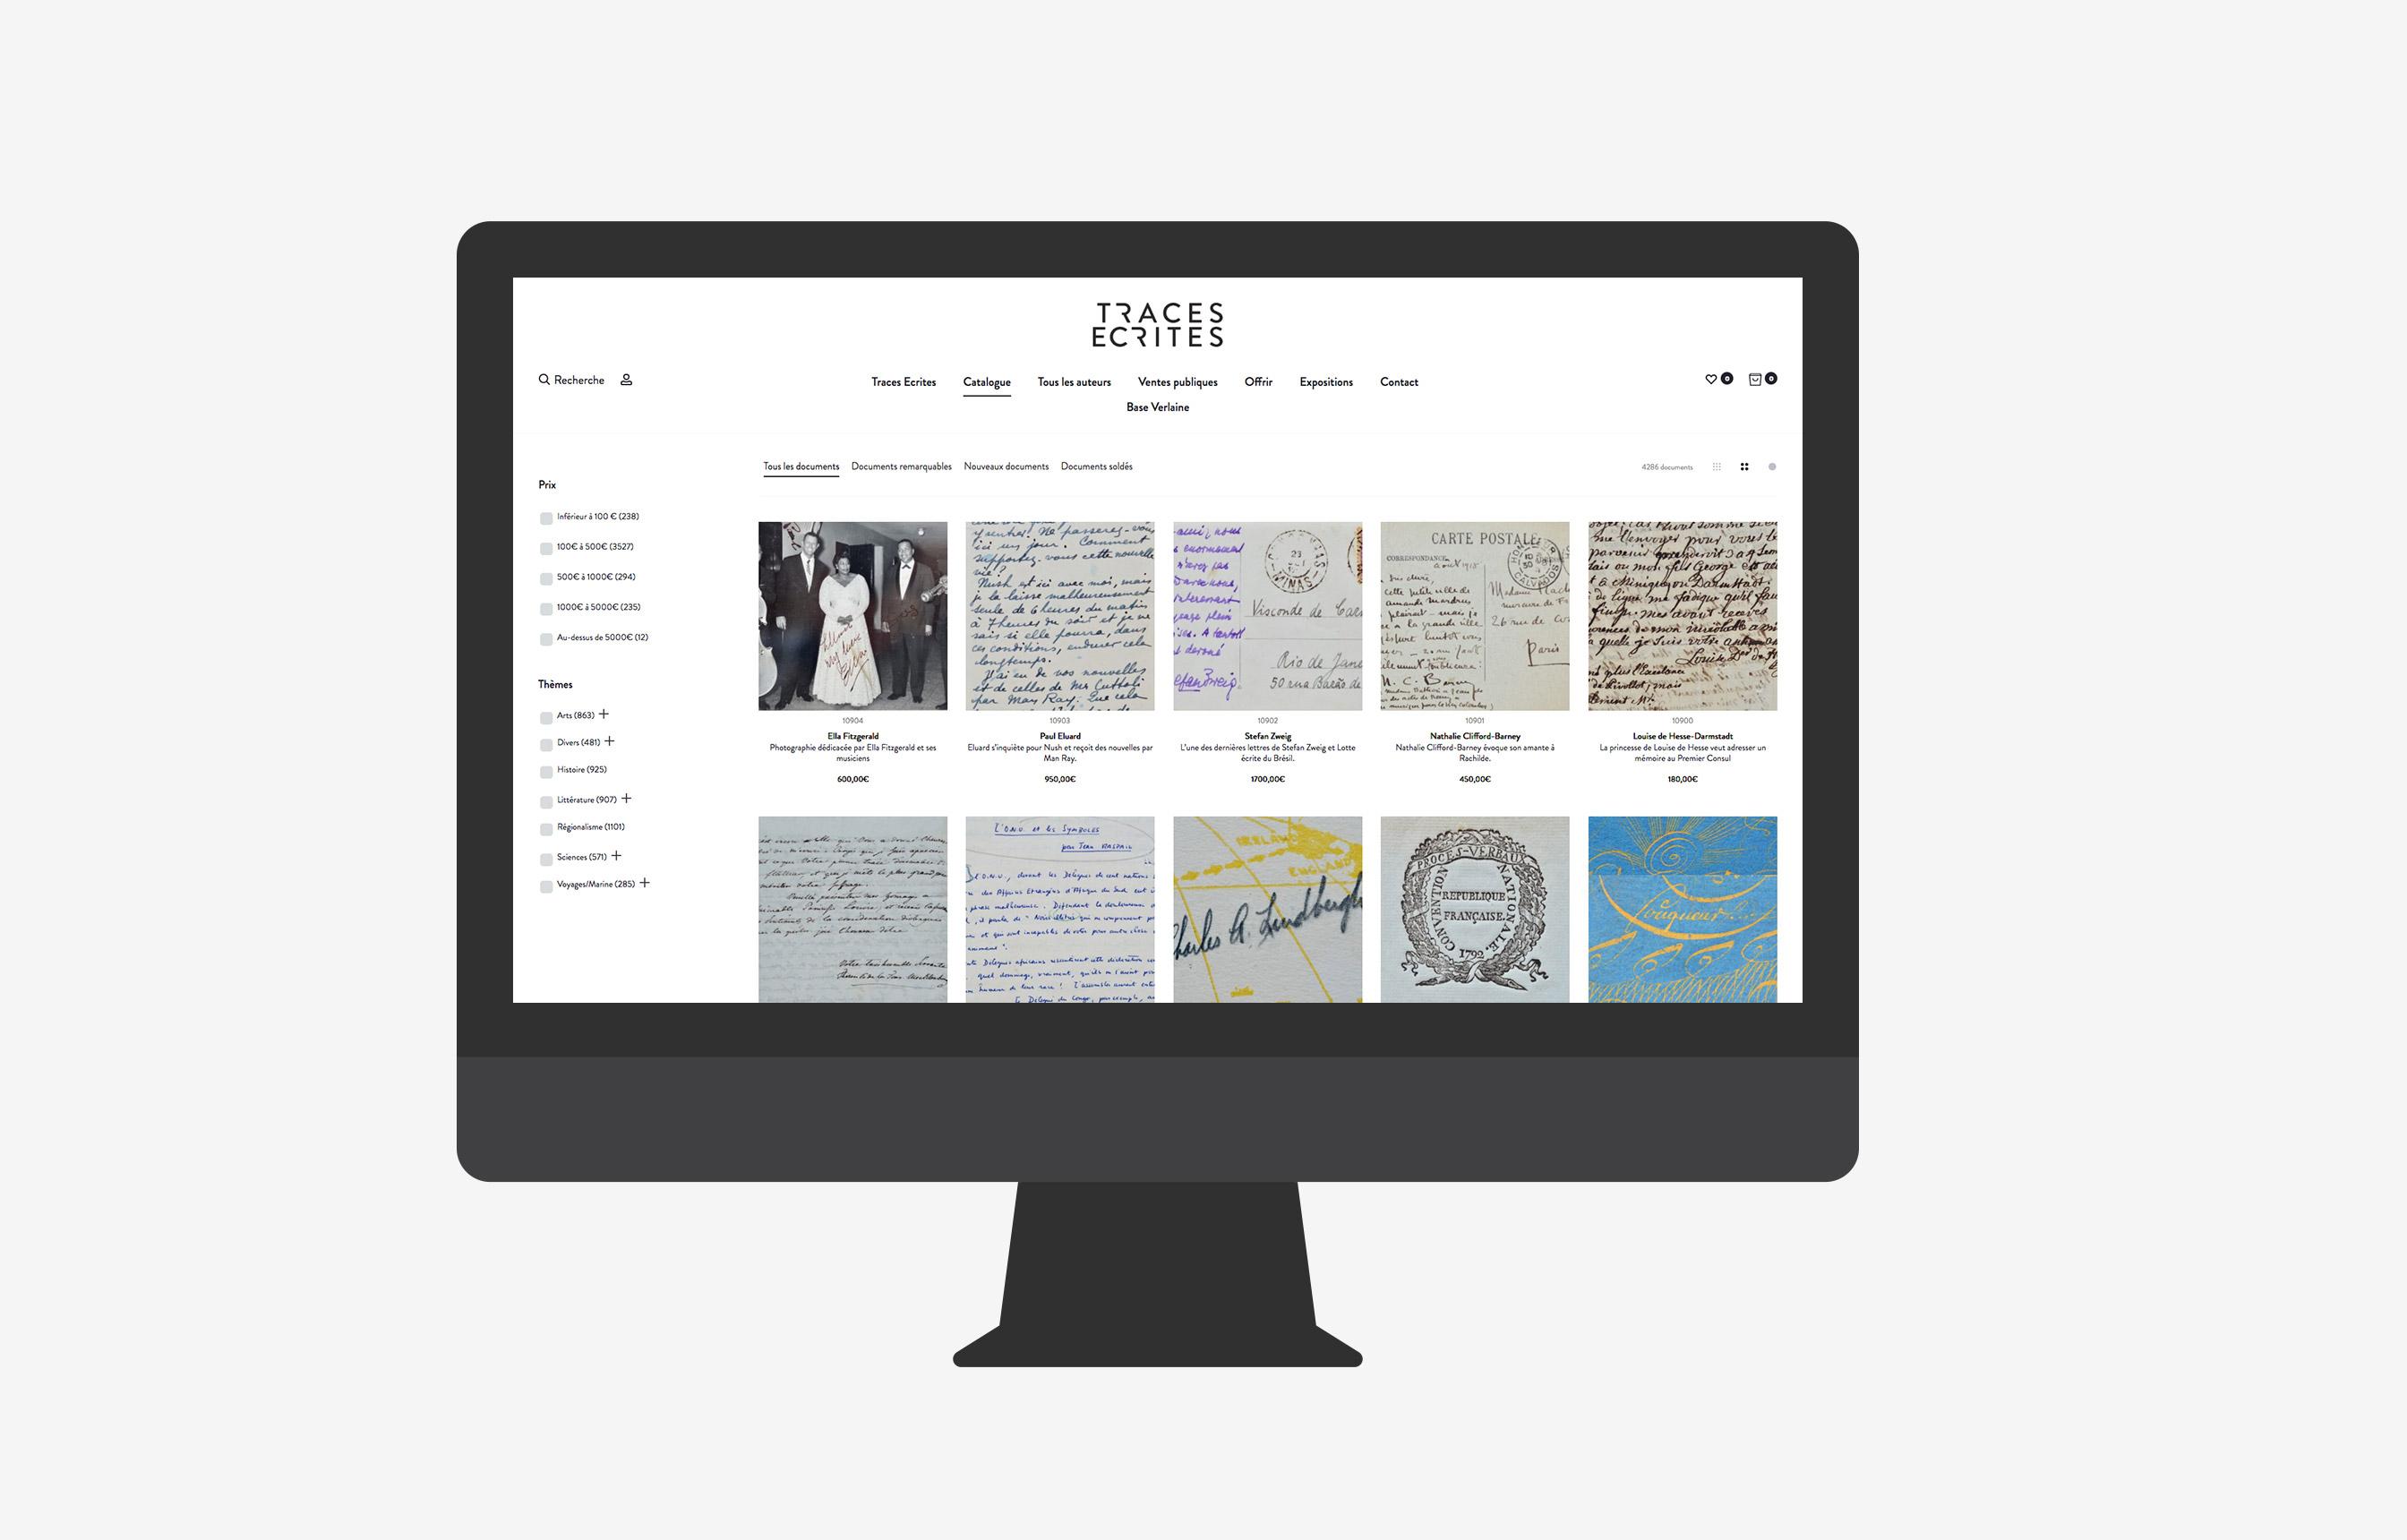 04-traces-ecrites-pikteo-webdesign-graphic-design-freelance-paris-bruxelles-londres